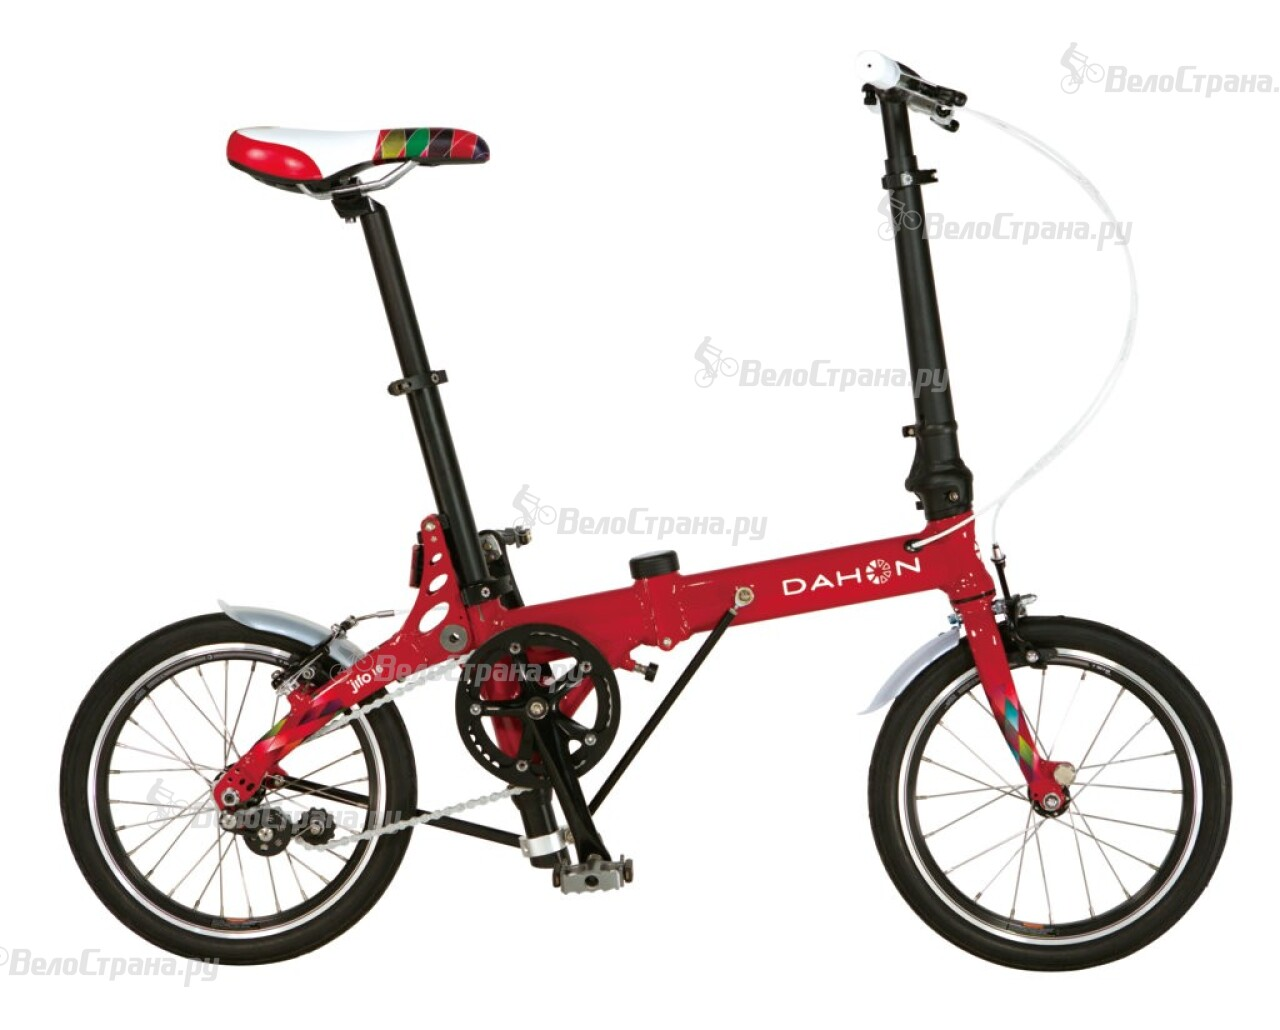 все цены на Велосипед Dahon Jifo (2014) онлайн